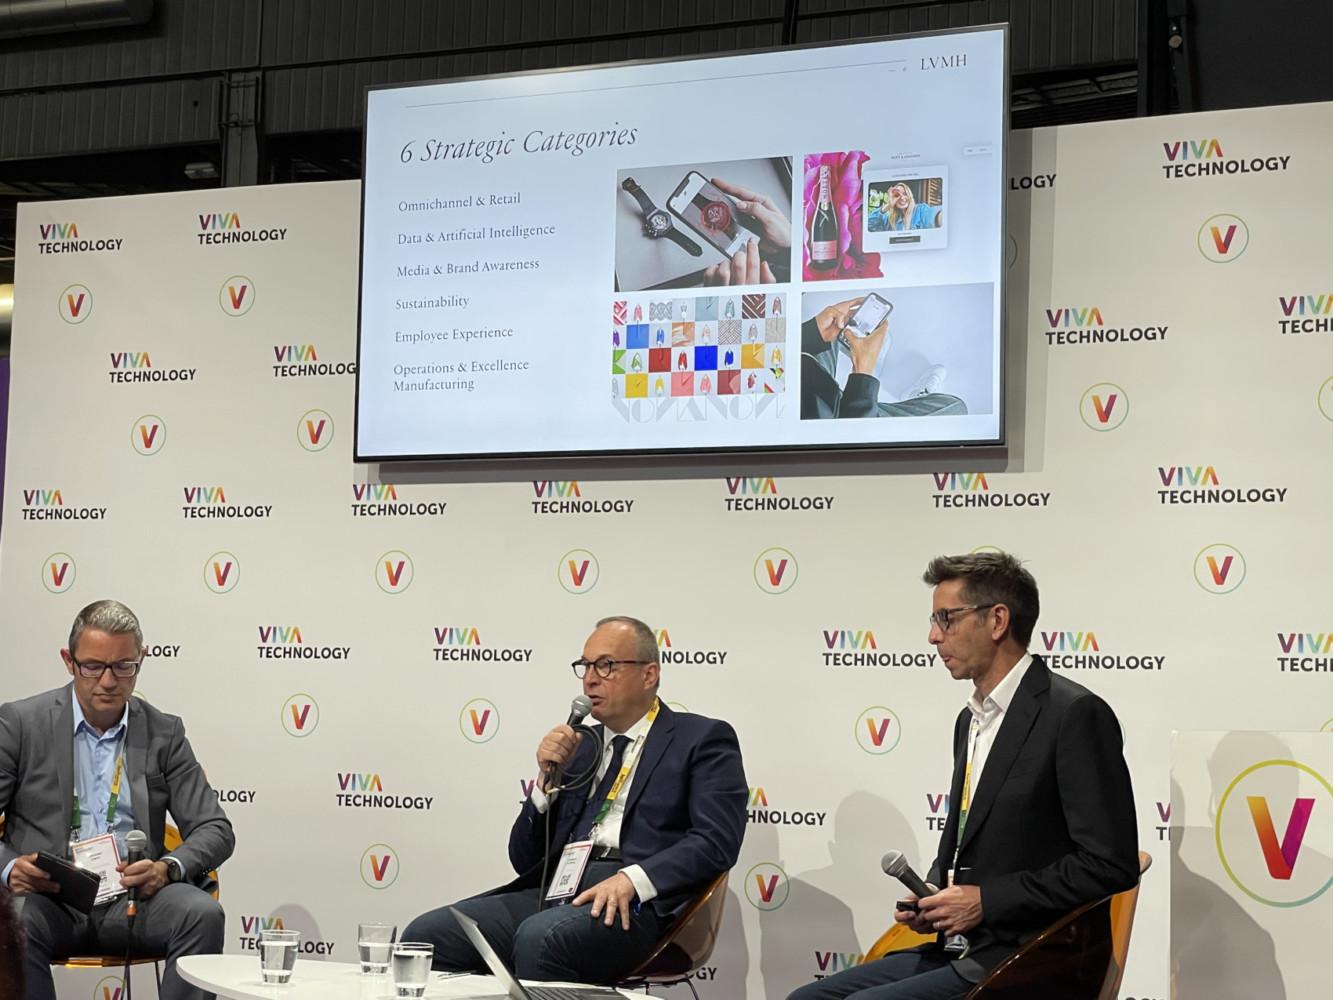 Conférence de presse LVMH - GOOGLE at Vivatech 2021 - Lab Luxury and Retail - 06 2021